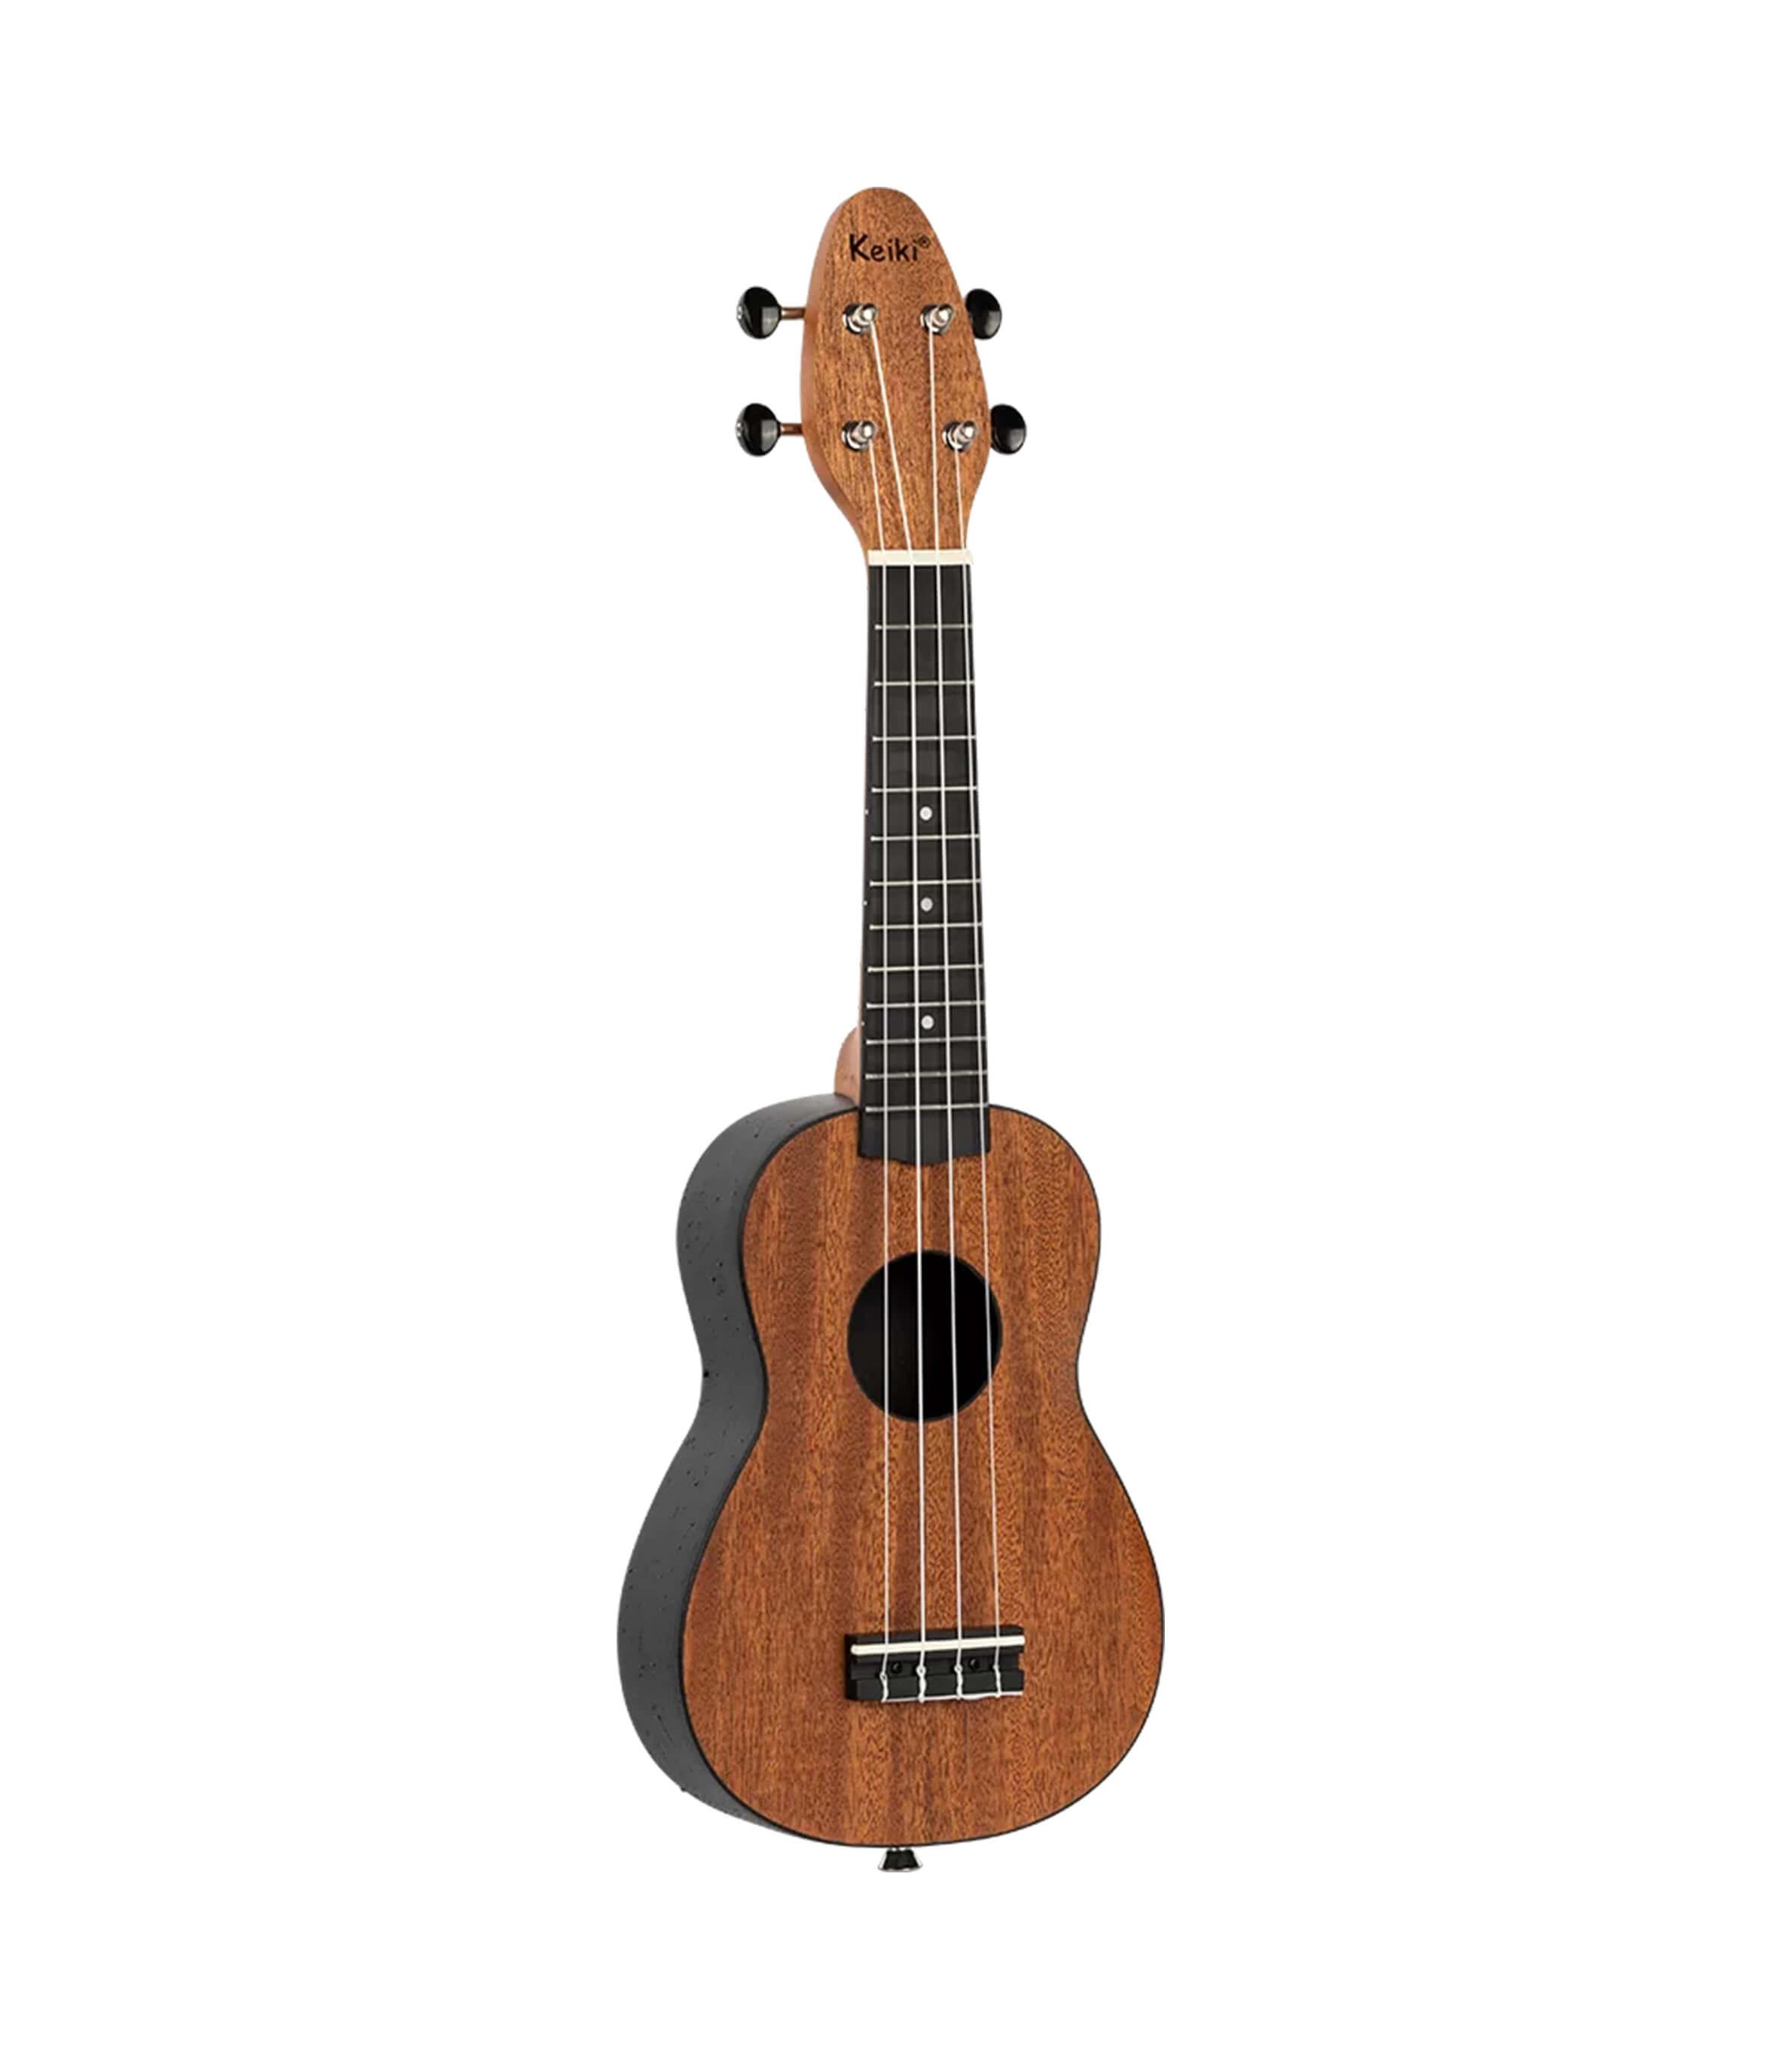 Ortega - K2-MAH - Melody House Musical Instruments